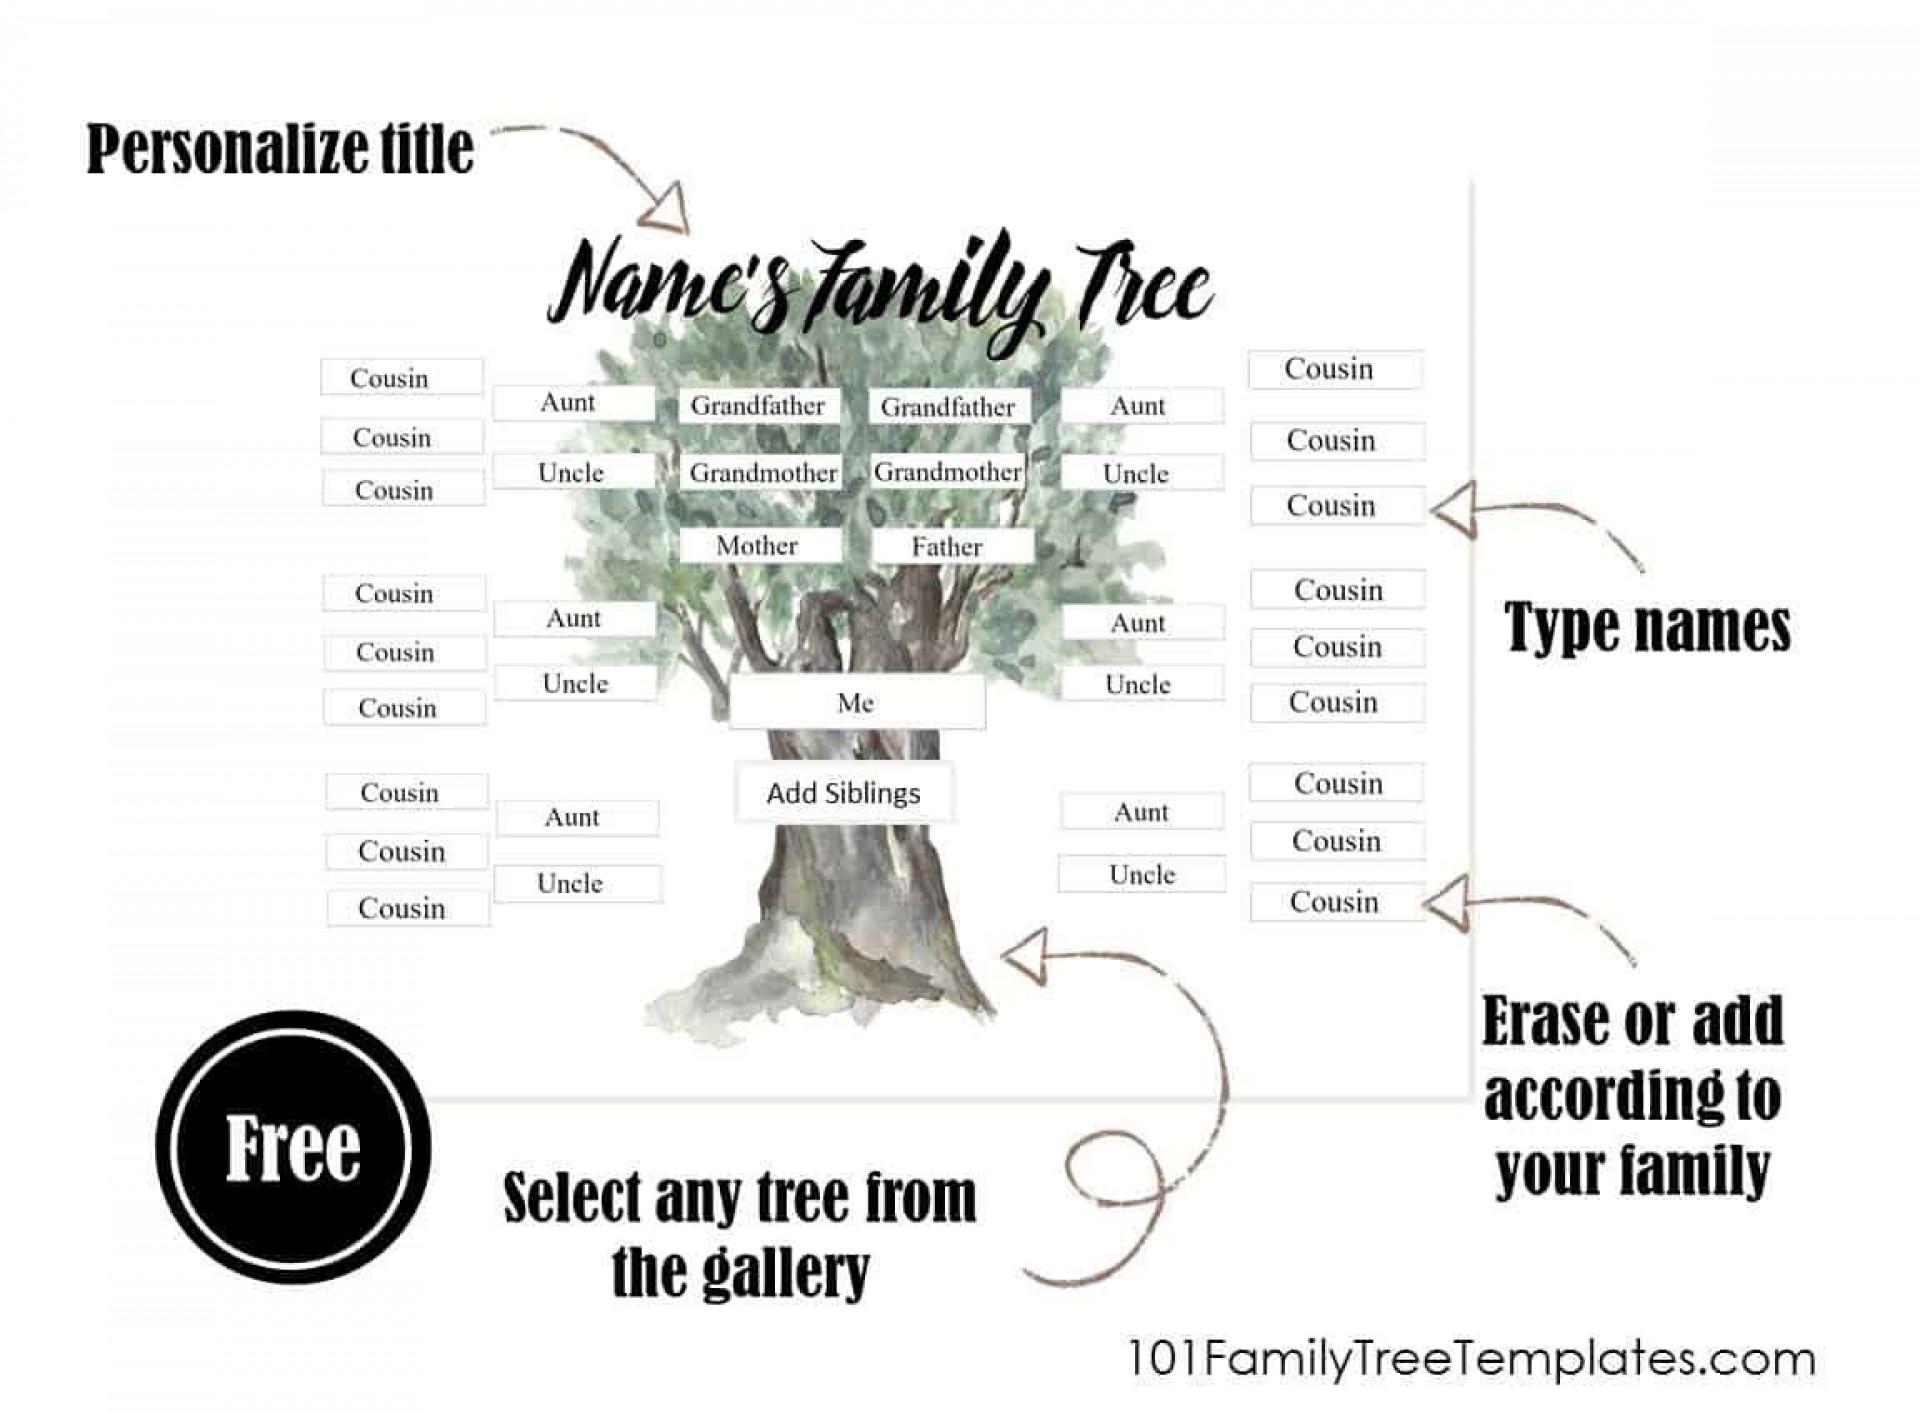 006 Wonderful Free Editable Family Tree Template With Sibling High Def  Siblings1920